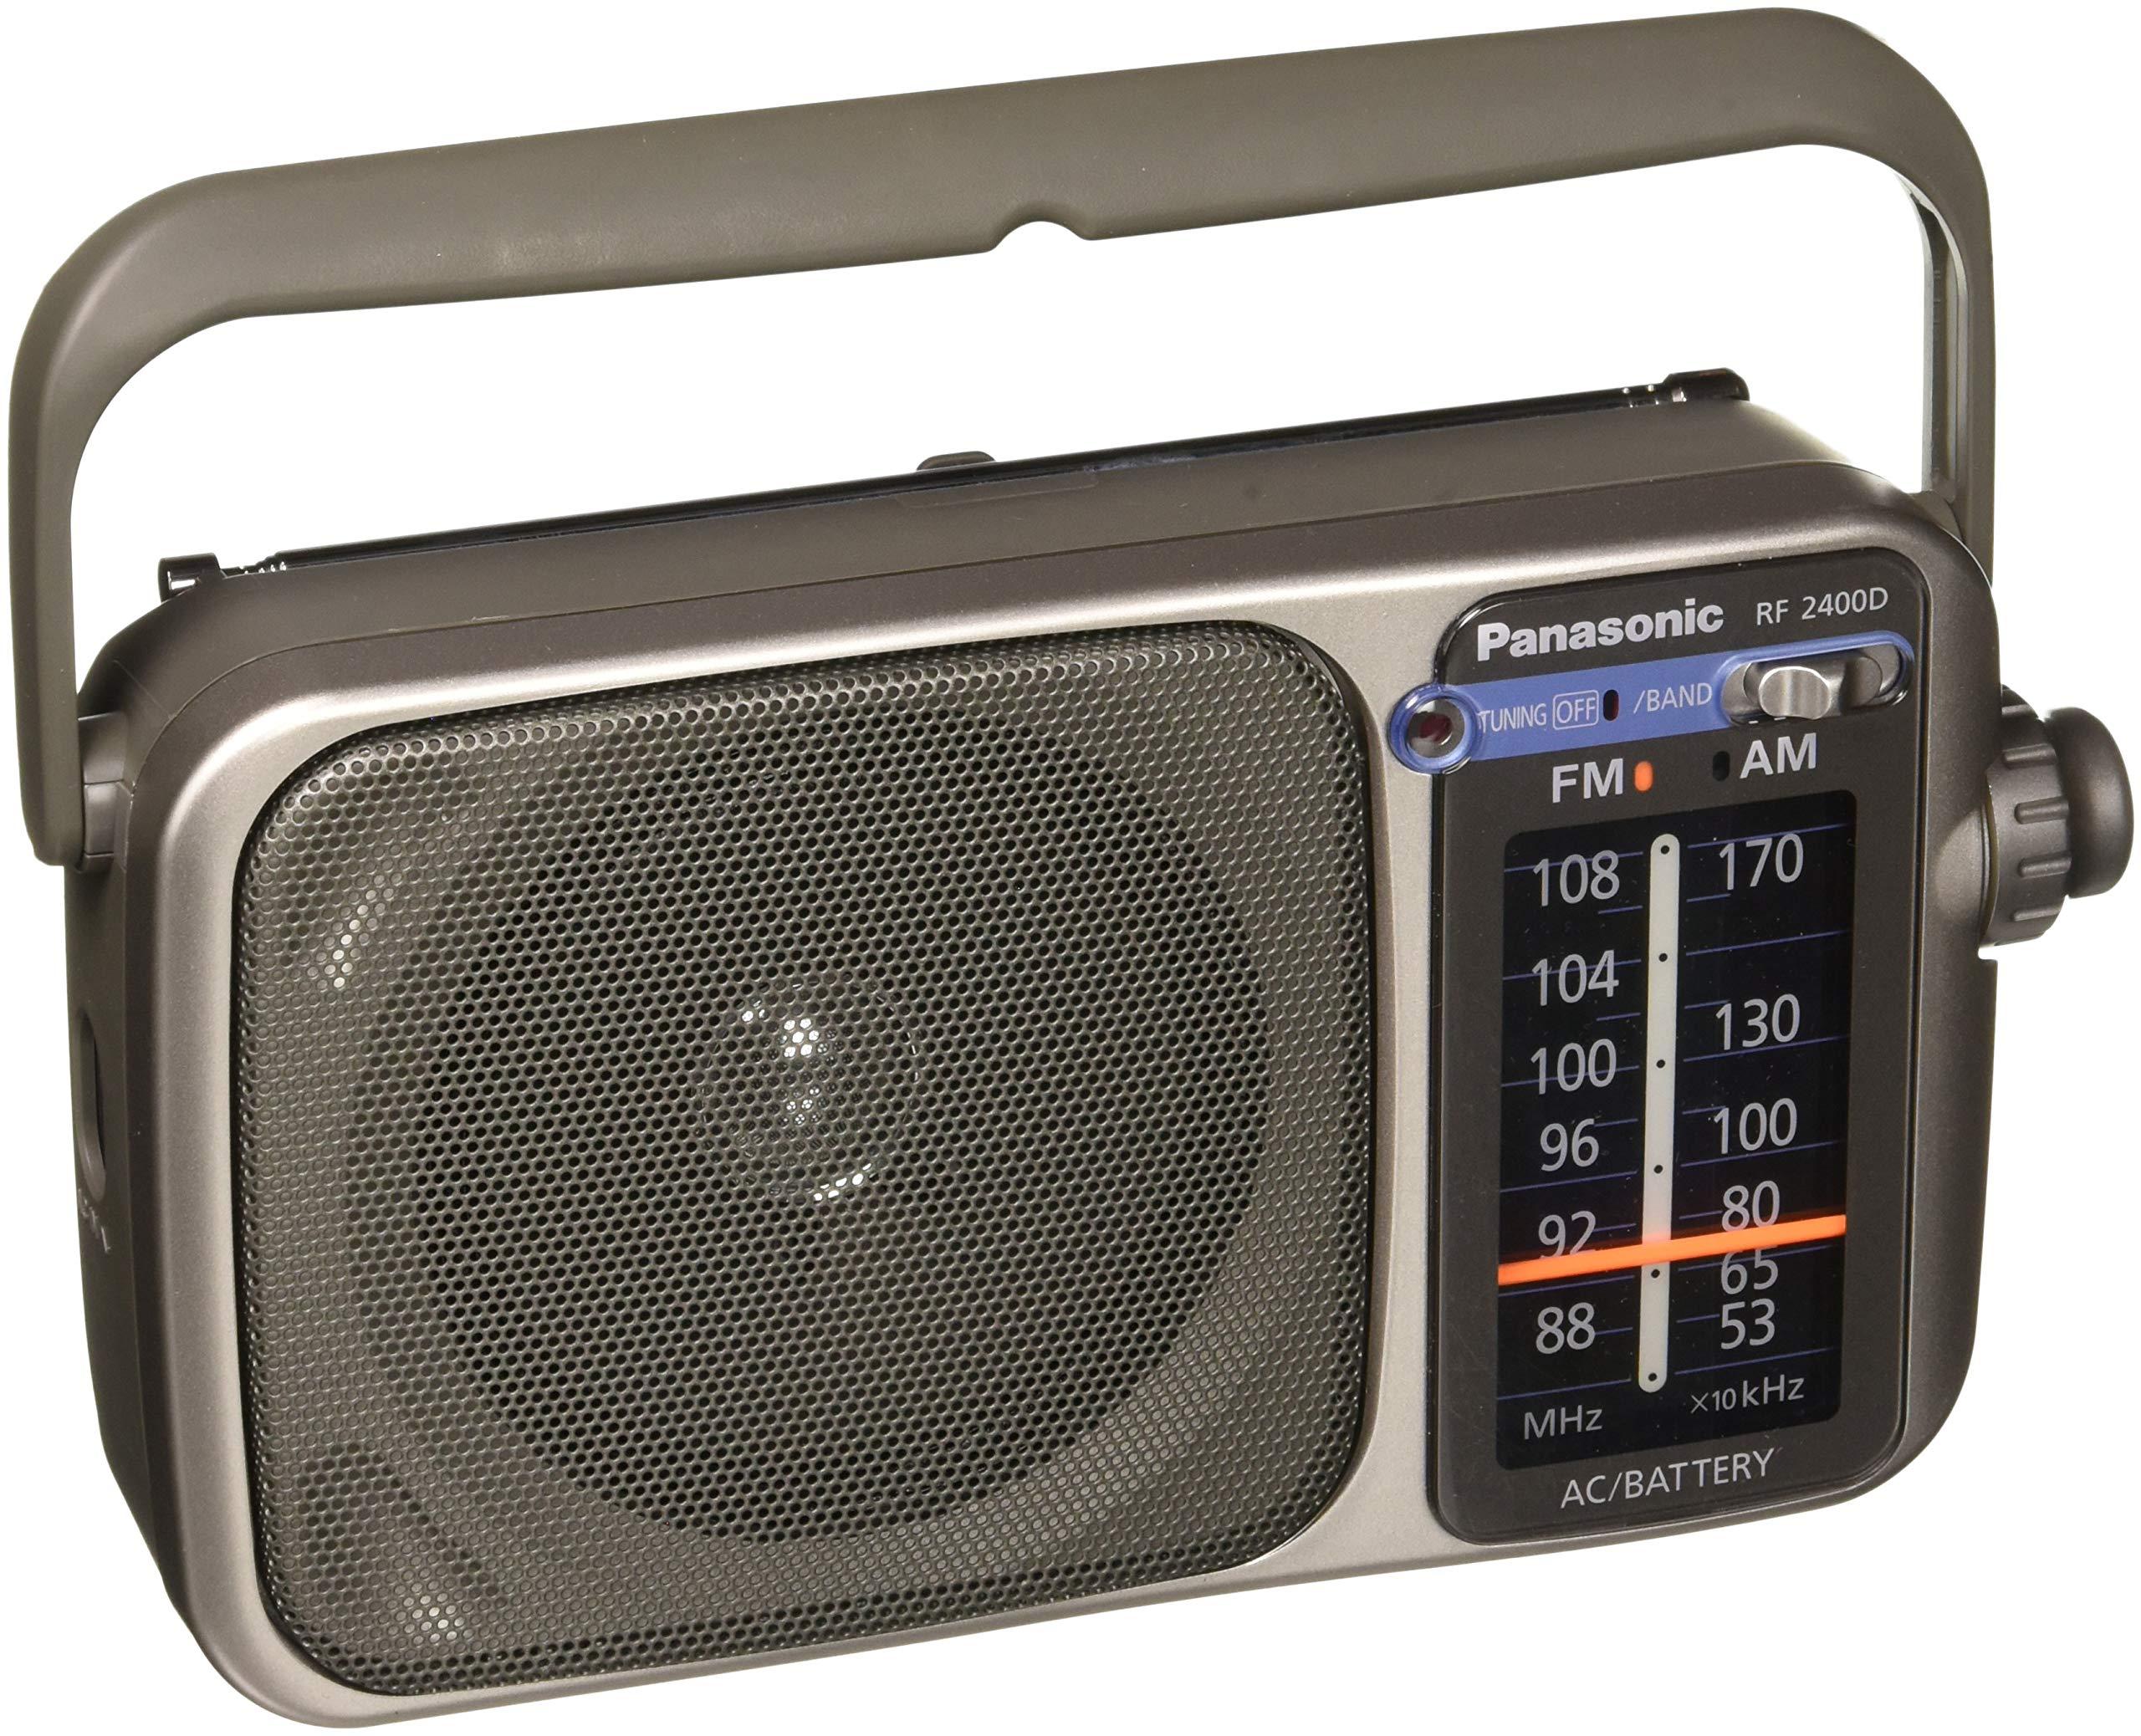 Panasonic RF 2400D AM Radio Silver